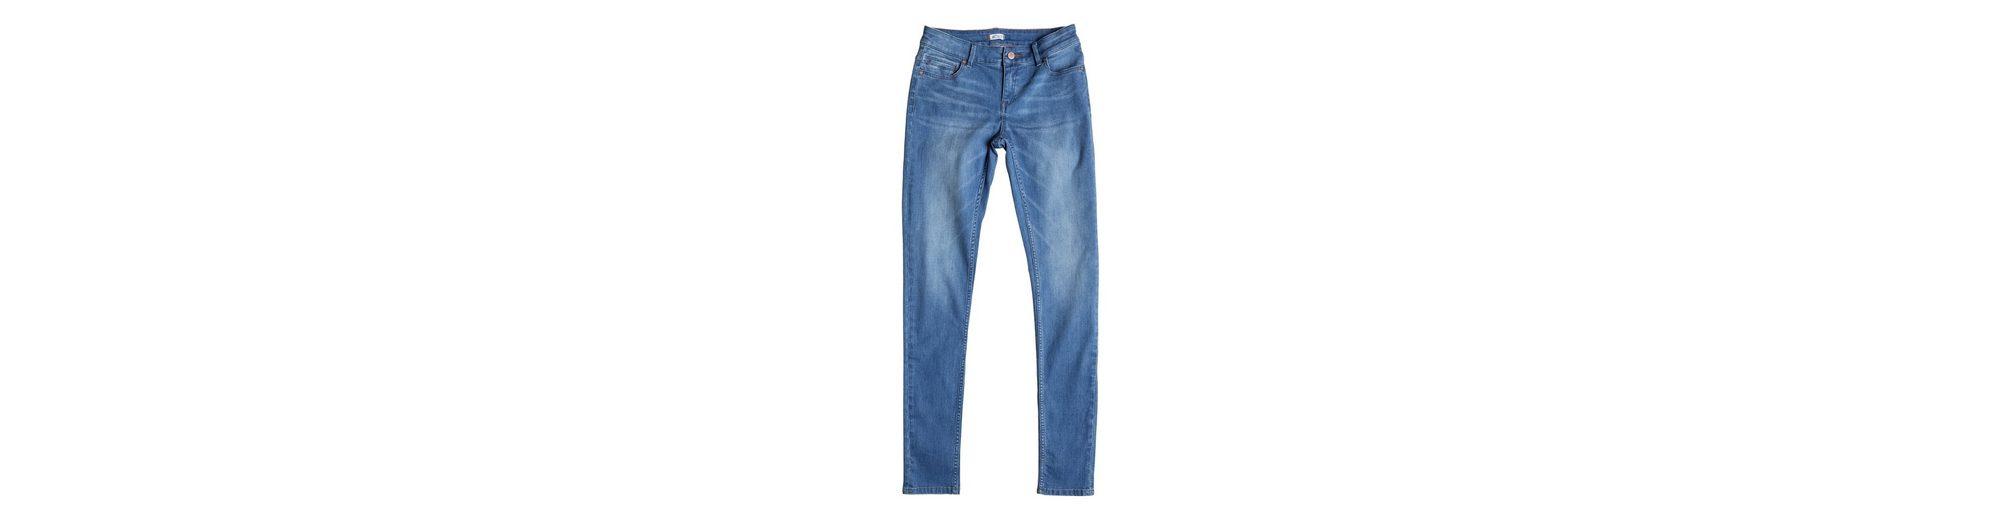 Modestil Roxy Skinny Fit Jeans Suntrippers C Genießen C3ZmKL